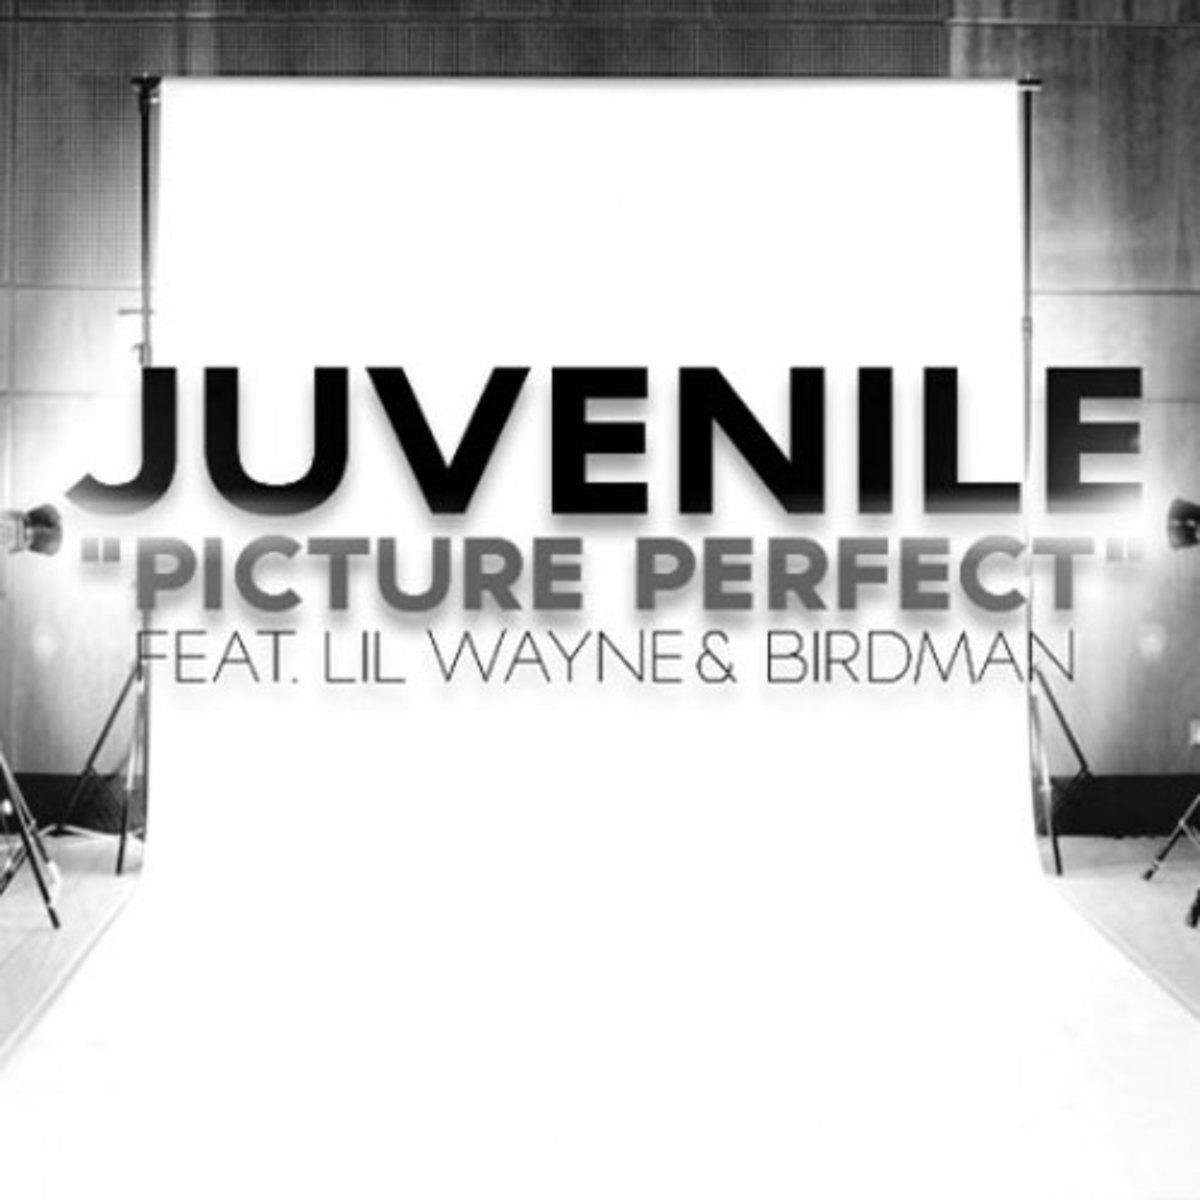 juvenile-pictureperfect.jpg